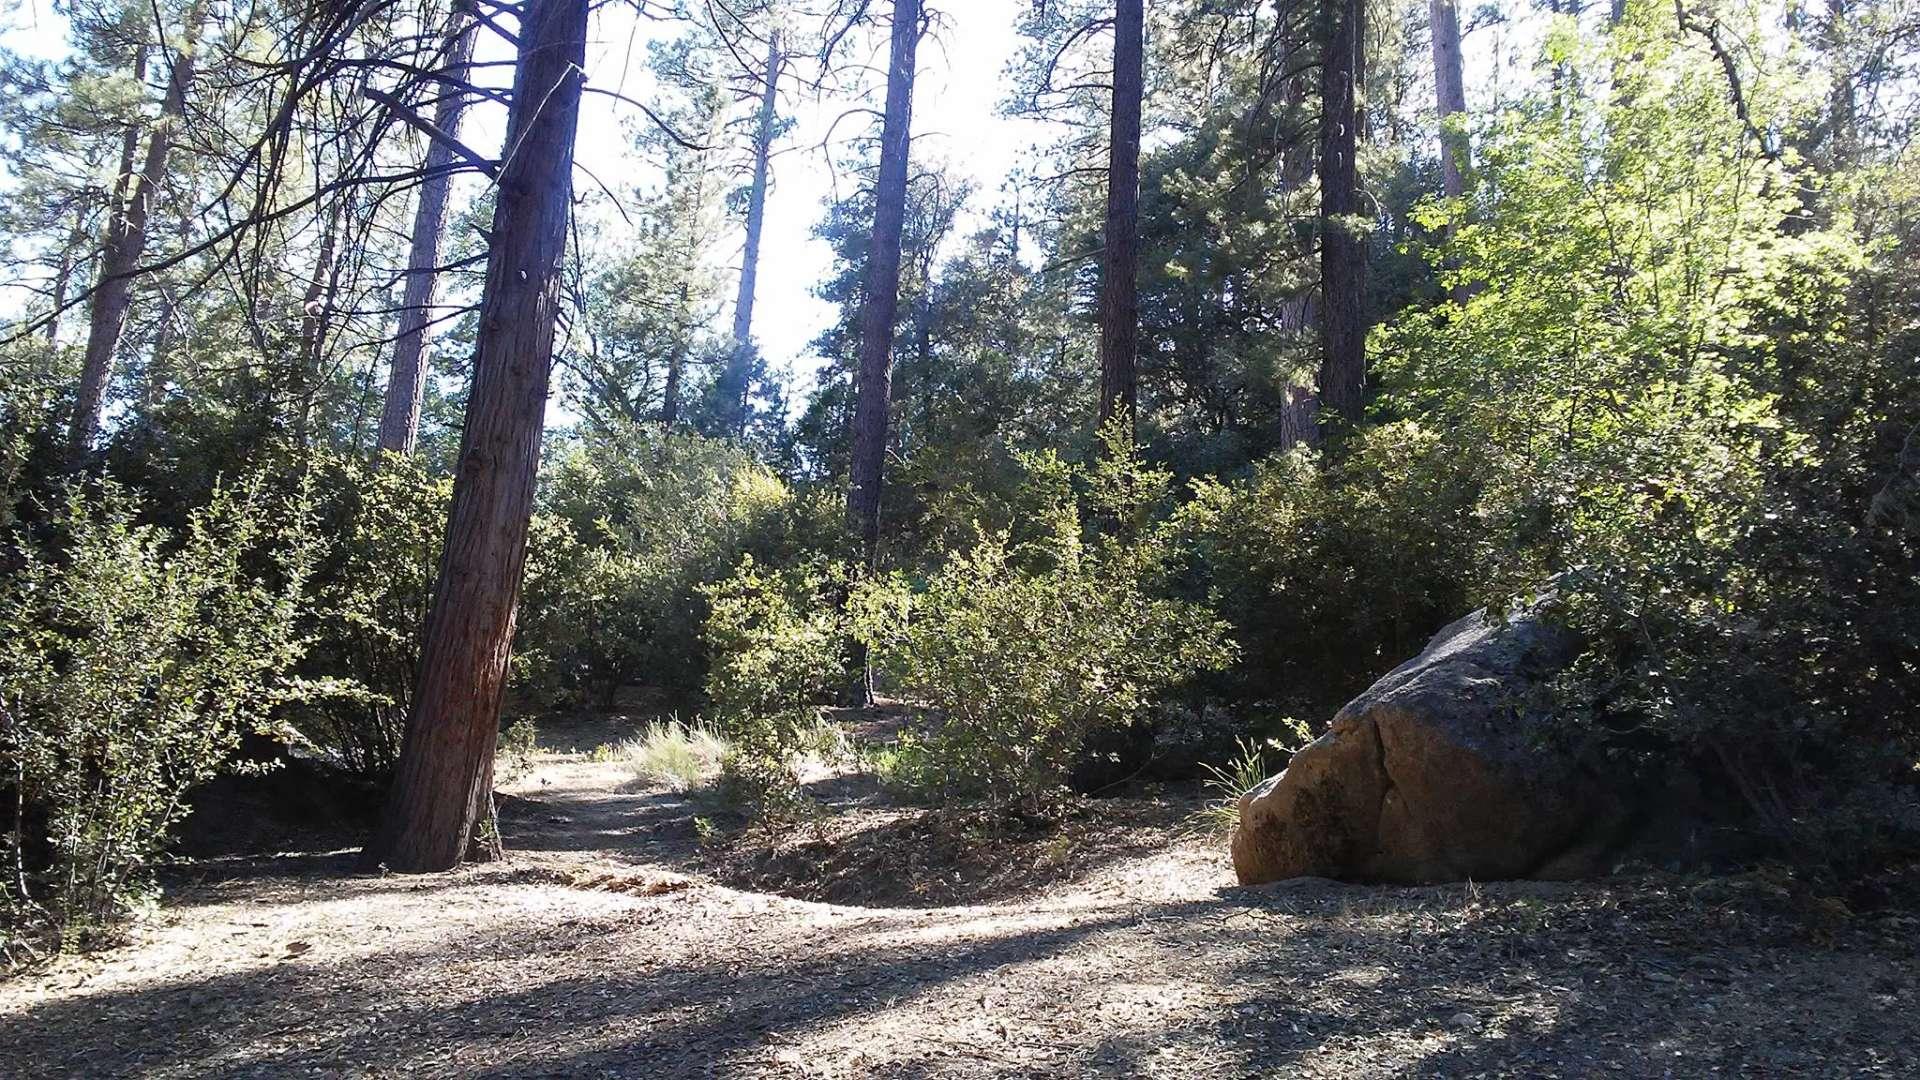 idyllwild campground, mount san jacinto, ca: 8 hipcamper reviews and